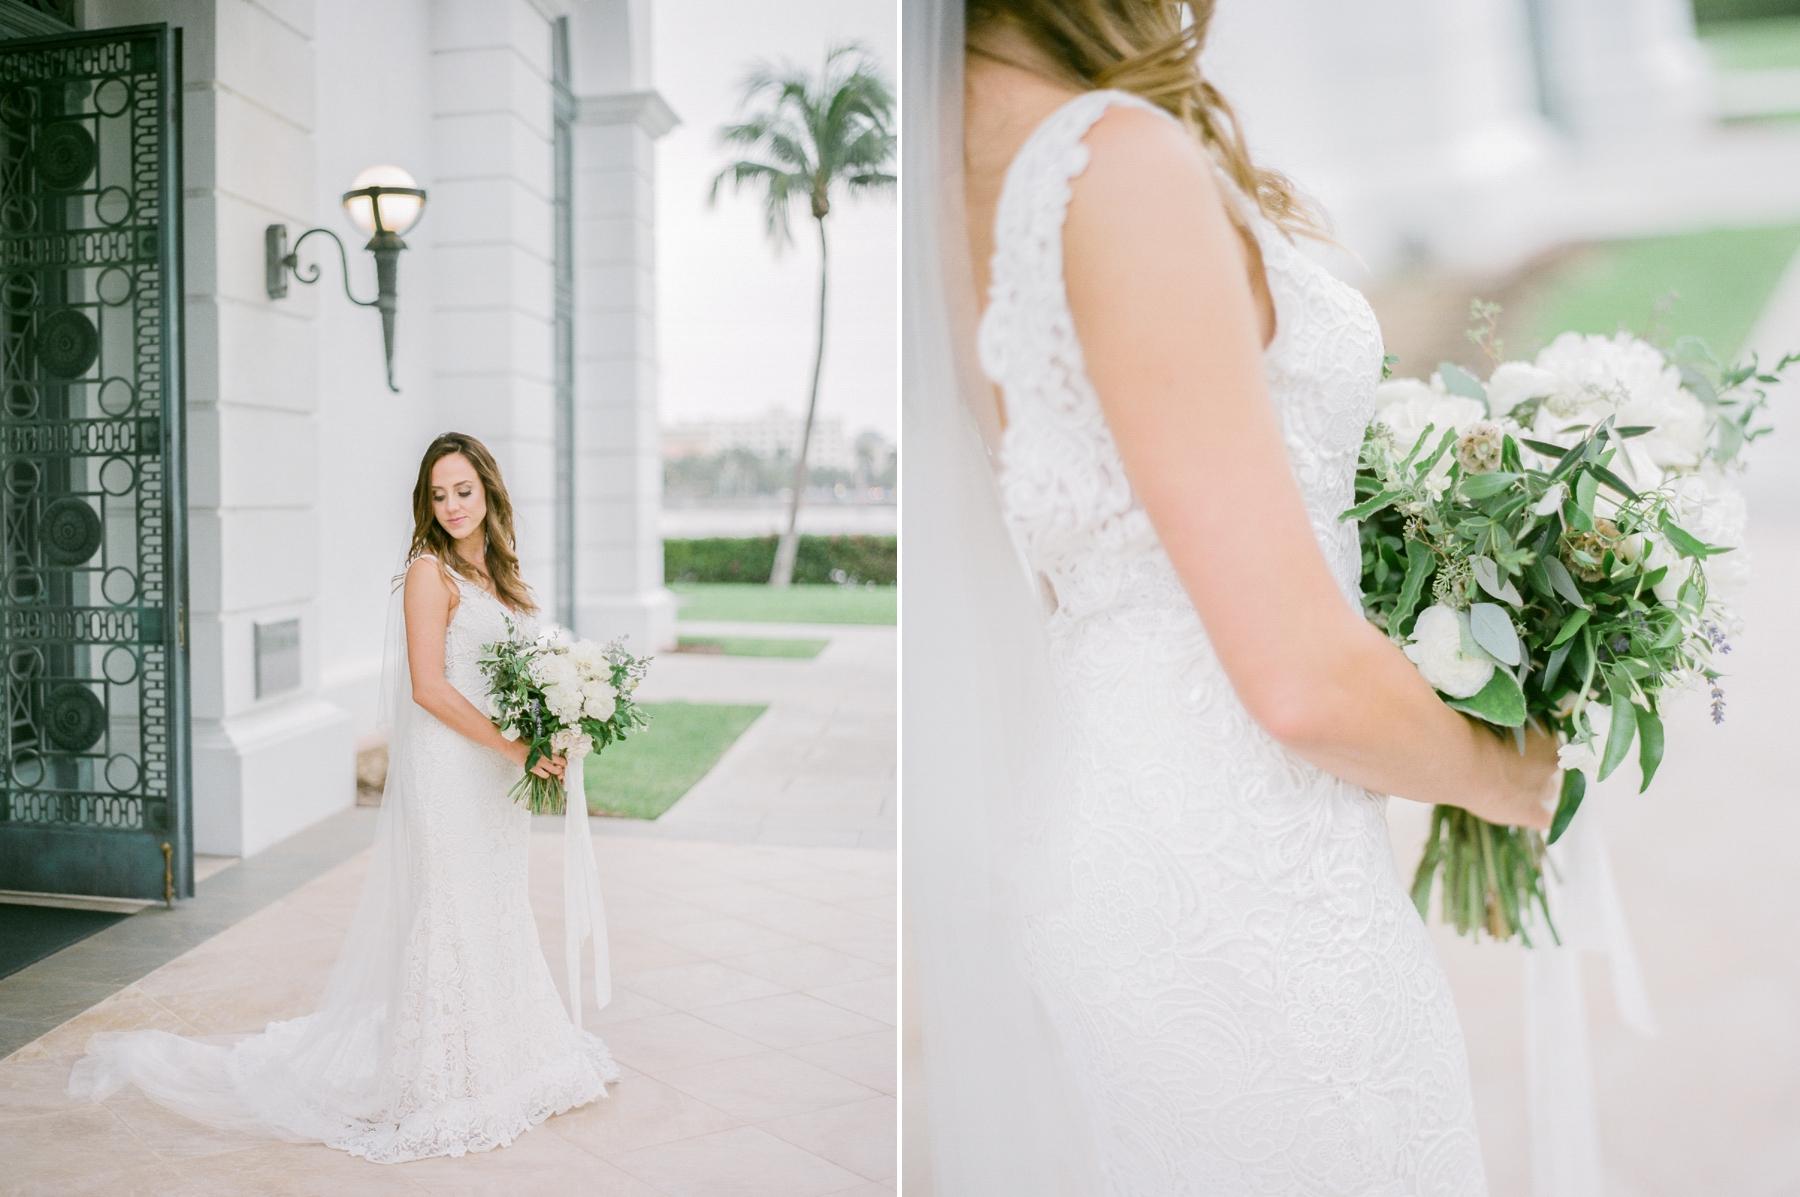 Bridal portraits - Miami film photographer